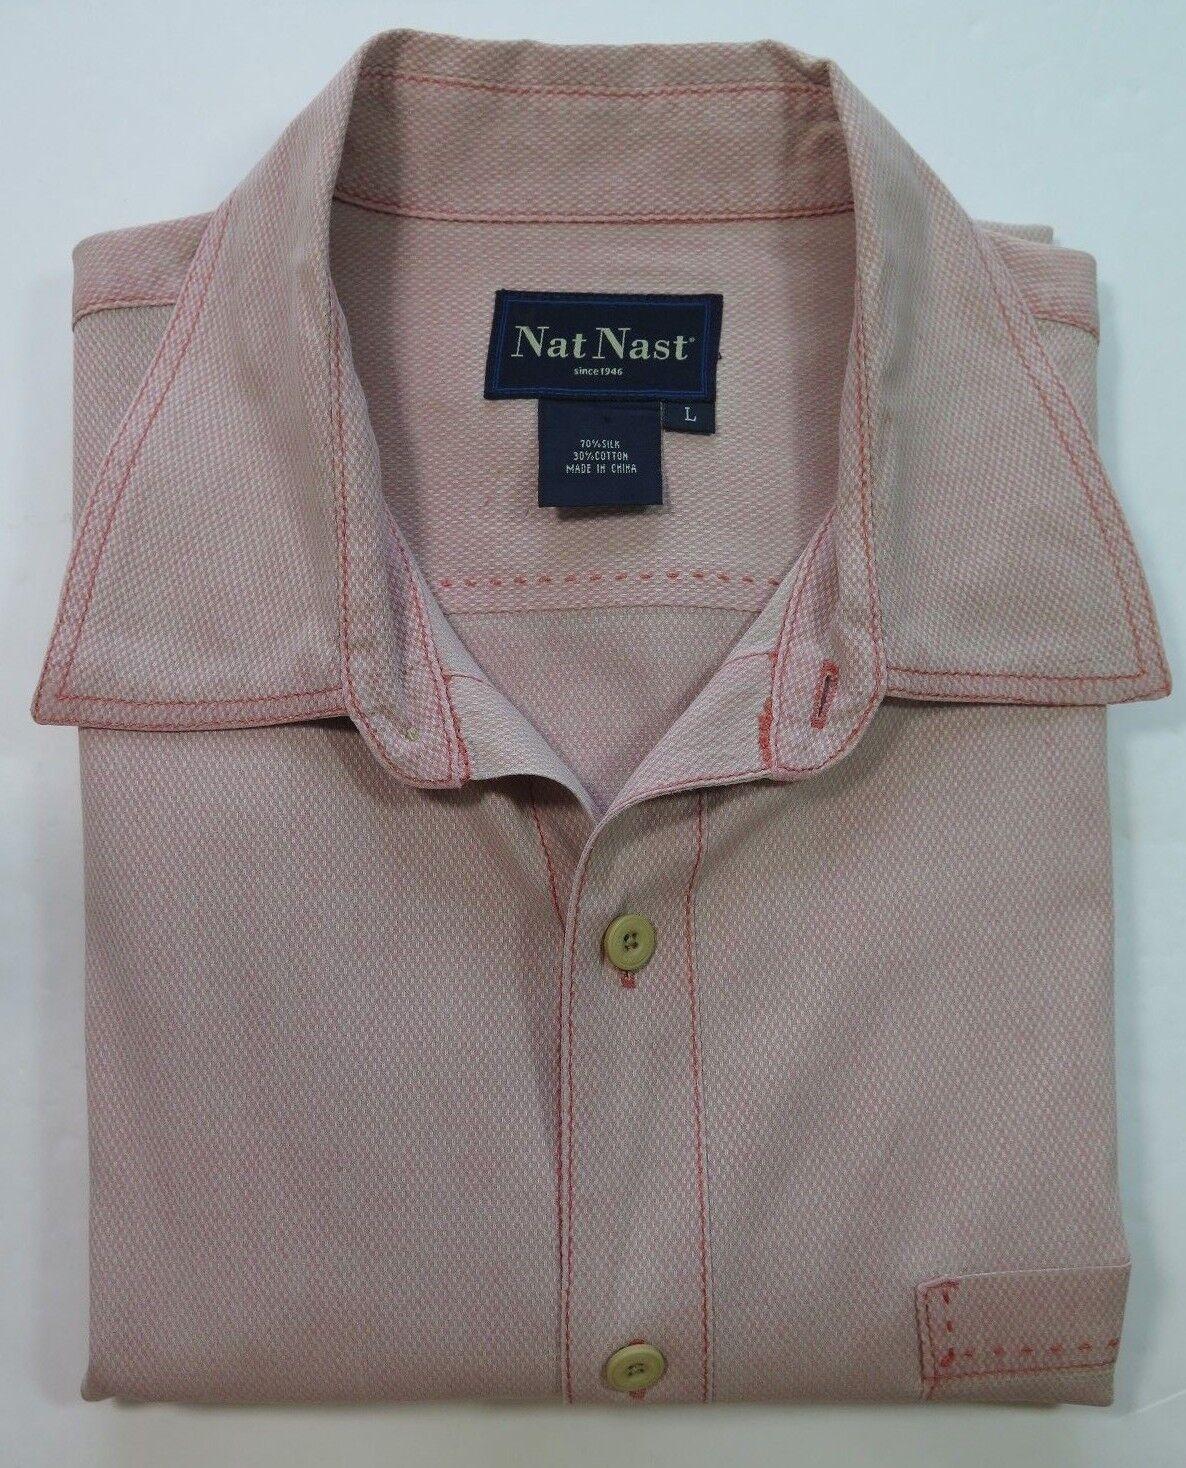 Nat Nast Luxury Original Silk Cotton Tango Red Light orange Camp Shirt Large EUC